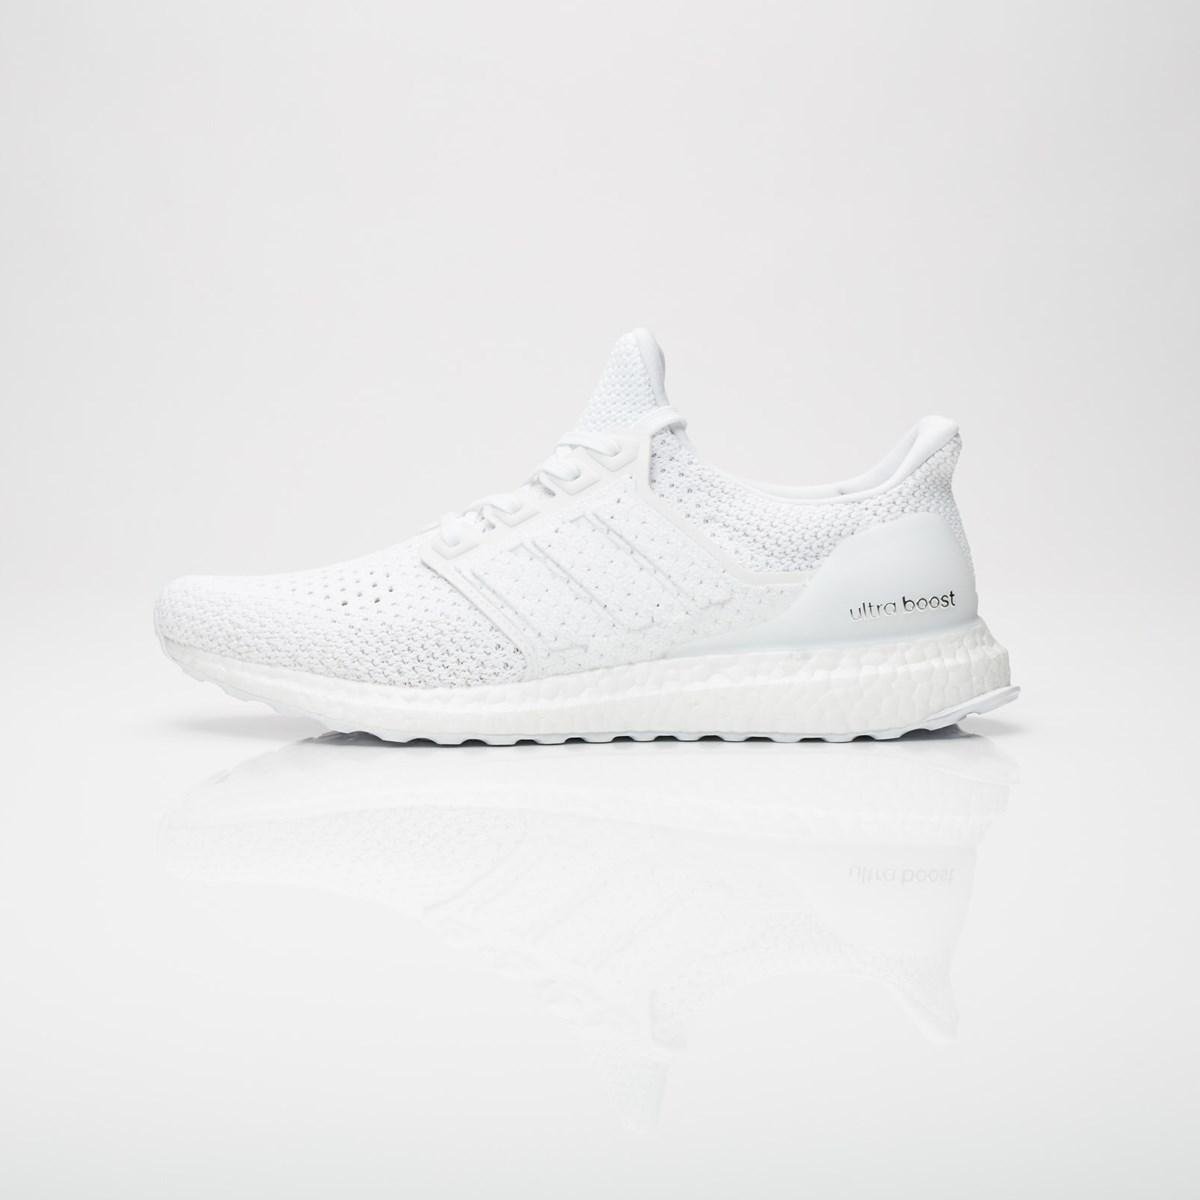 4ecf18fd1 adidas UltraBOOST CLIMA - By8888 - Sneakersnstuff